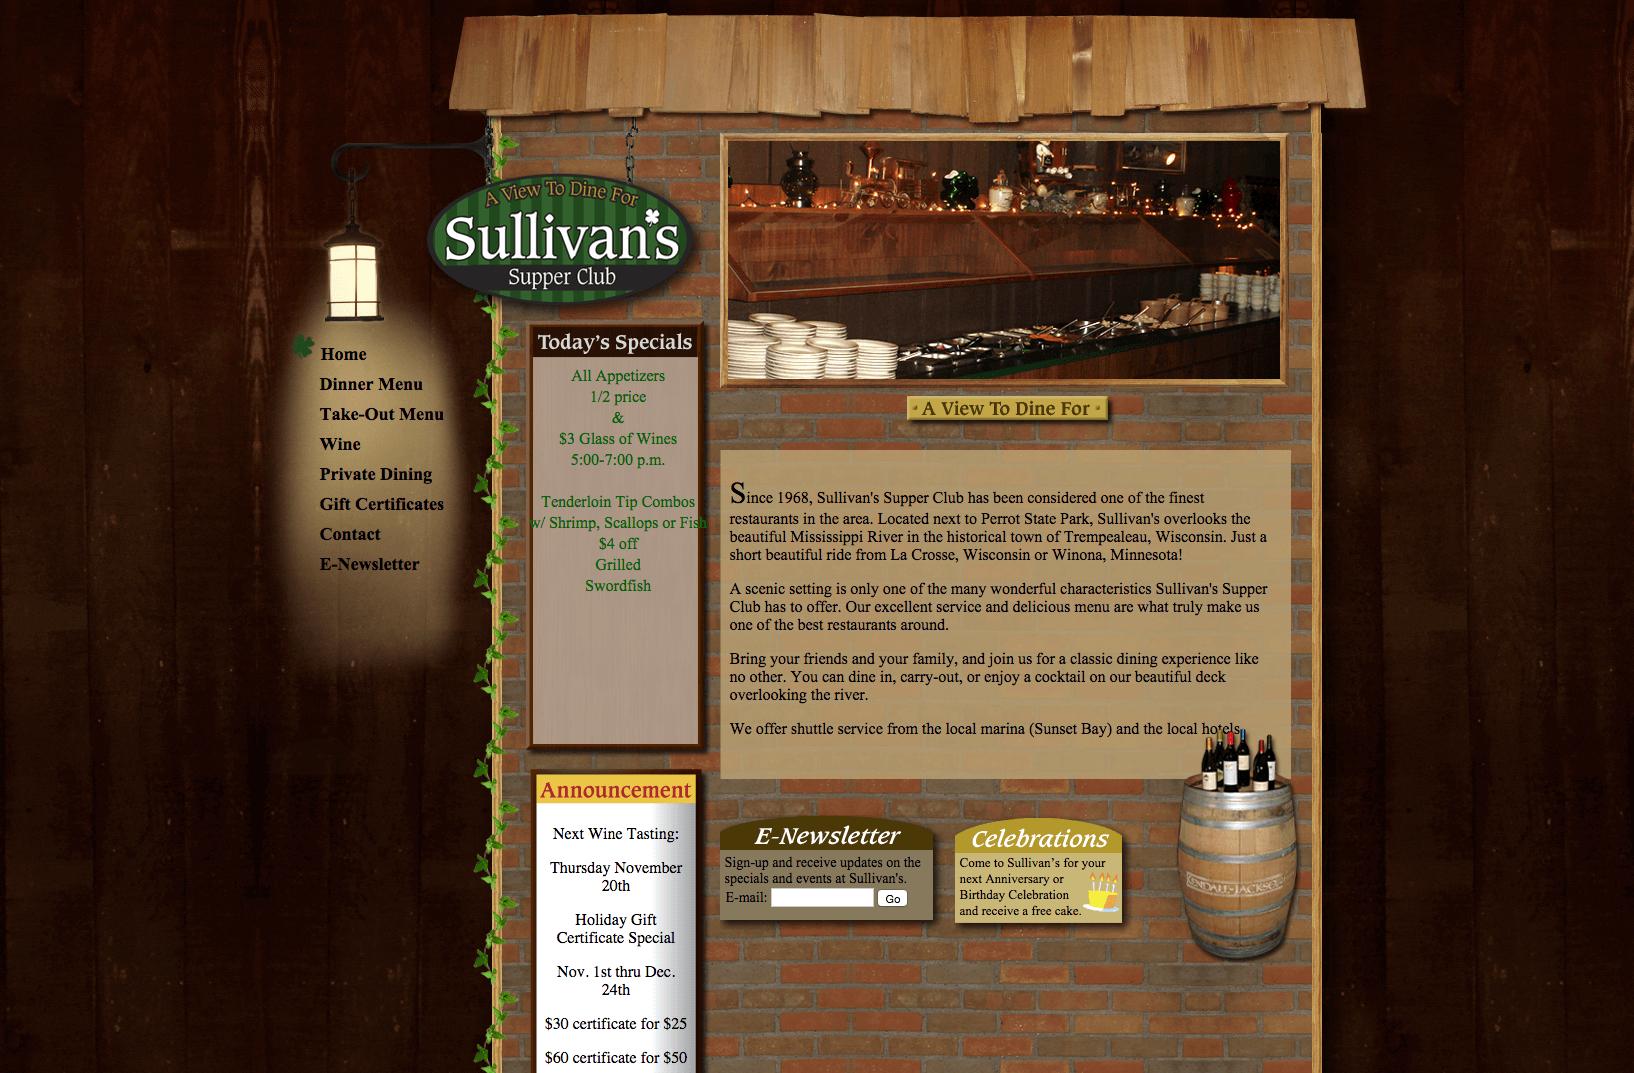 Sullivan's Supper Club Website